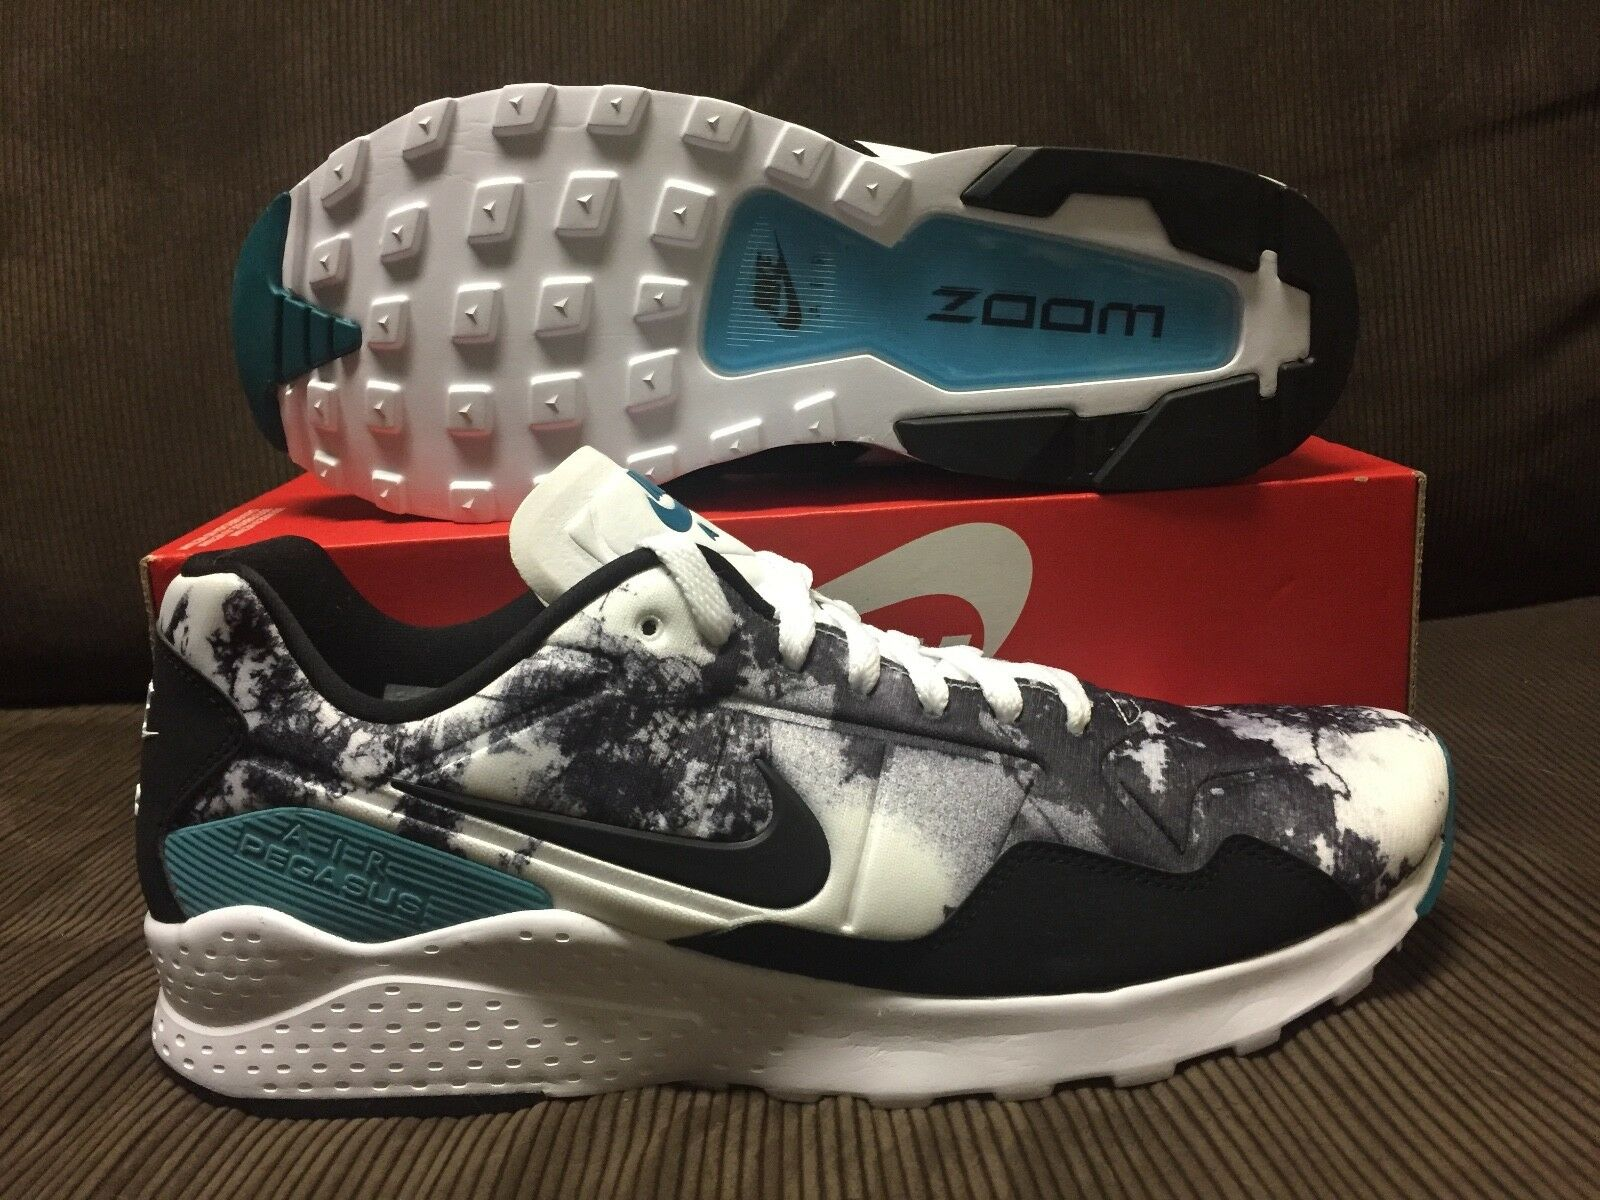 Nike air zoom pegasus 92 sz 12 nuovi nero / bianco / verde